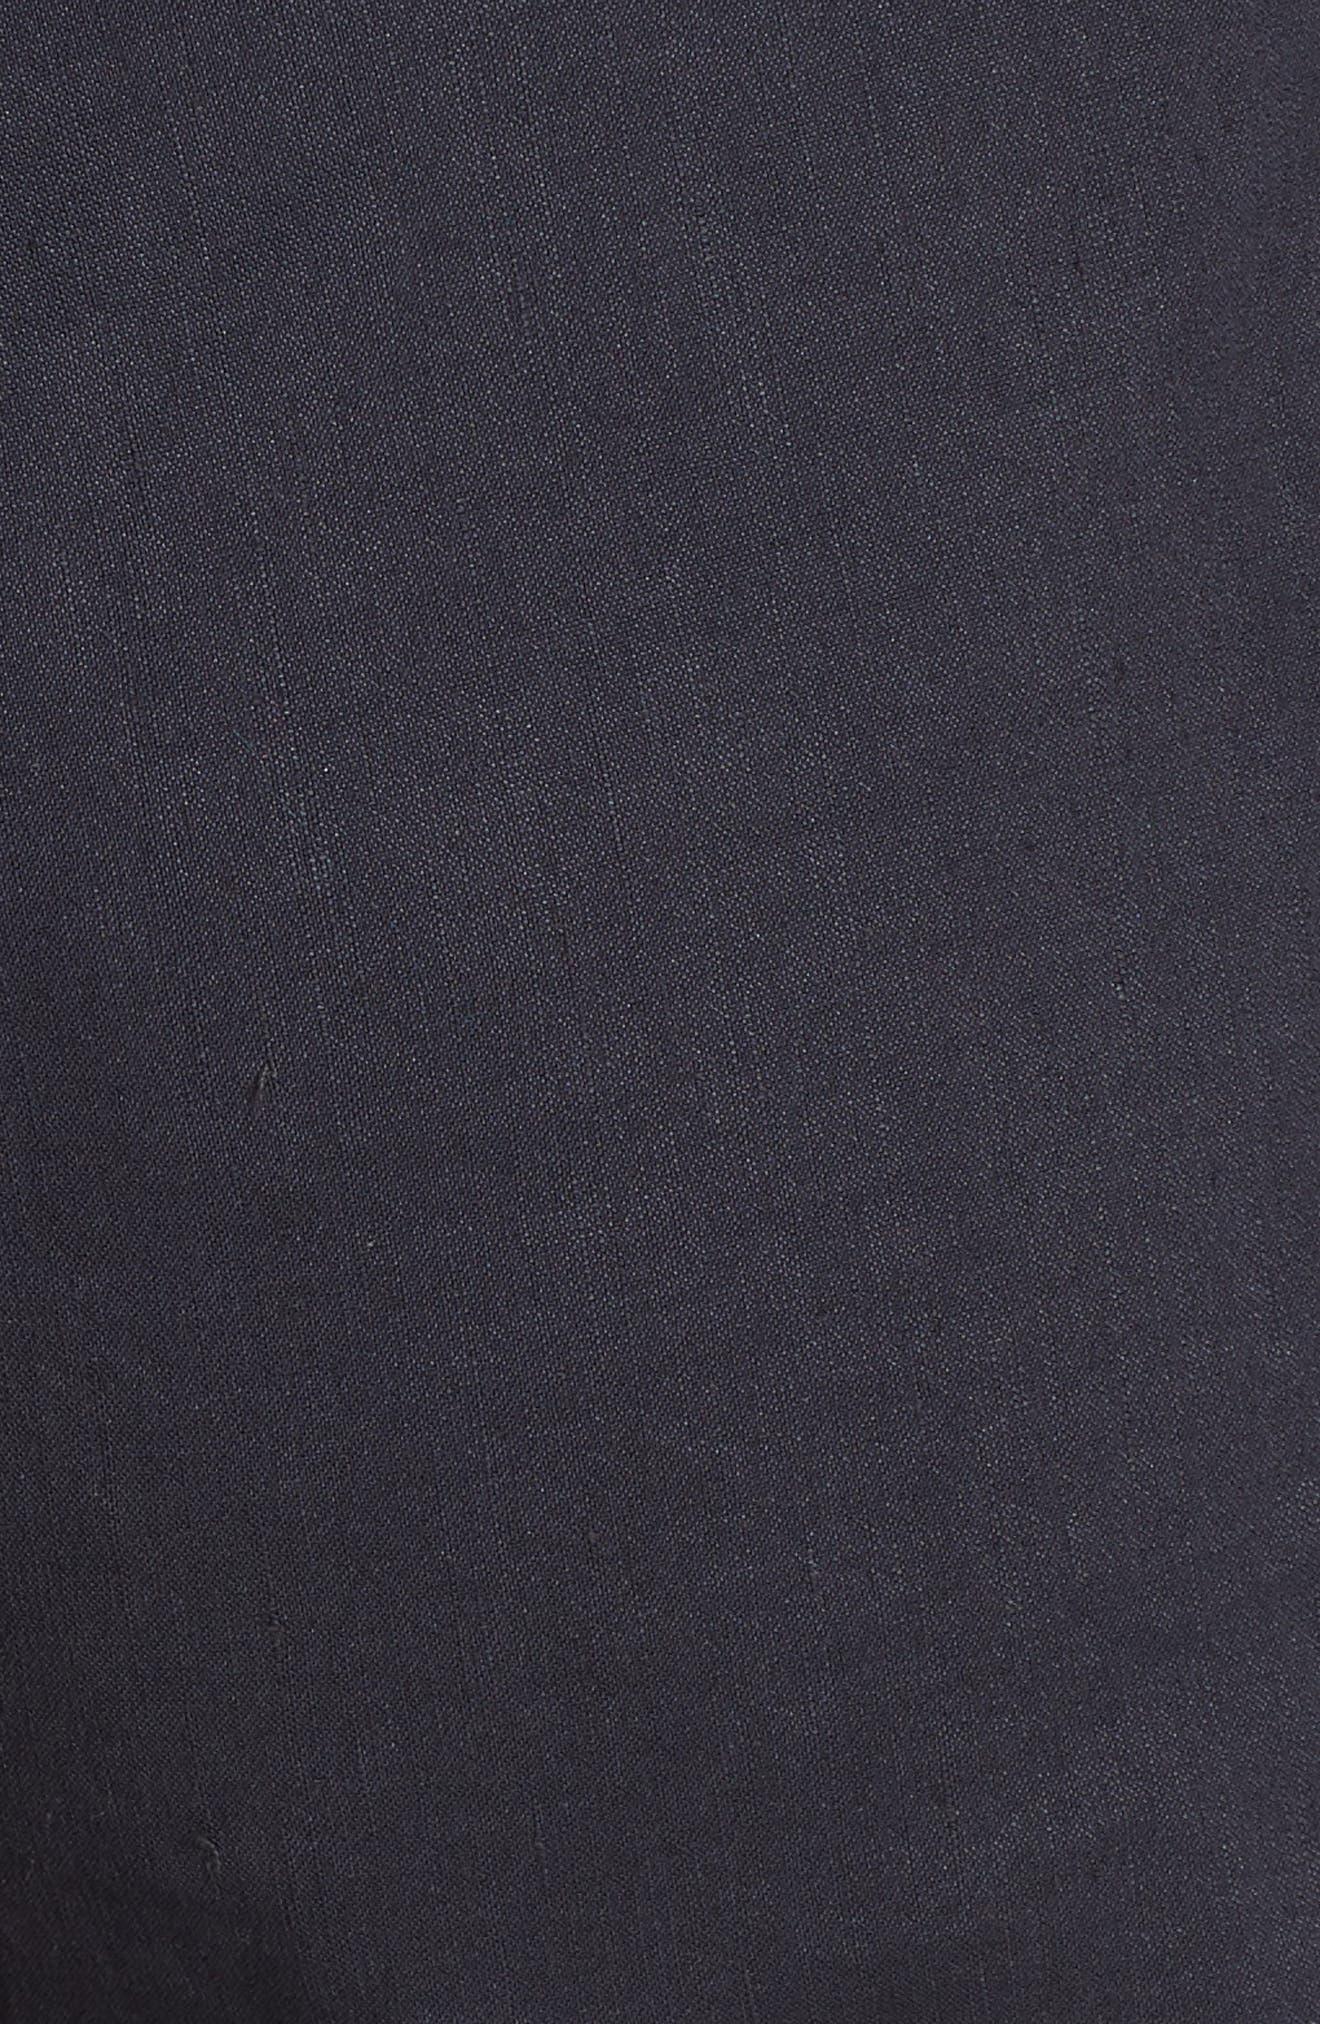 Pull-On Linen Blend Pants,                             Alternate thumbnail 3, color,                             Concord